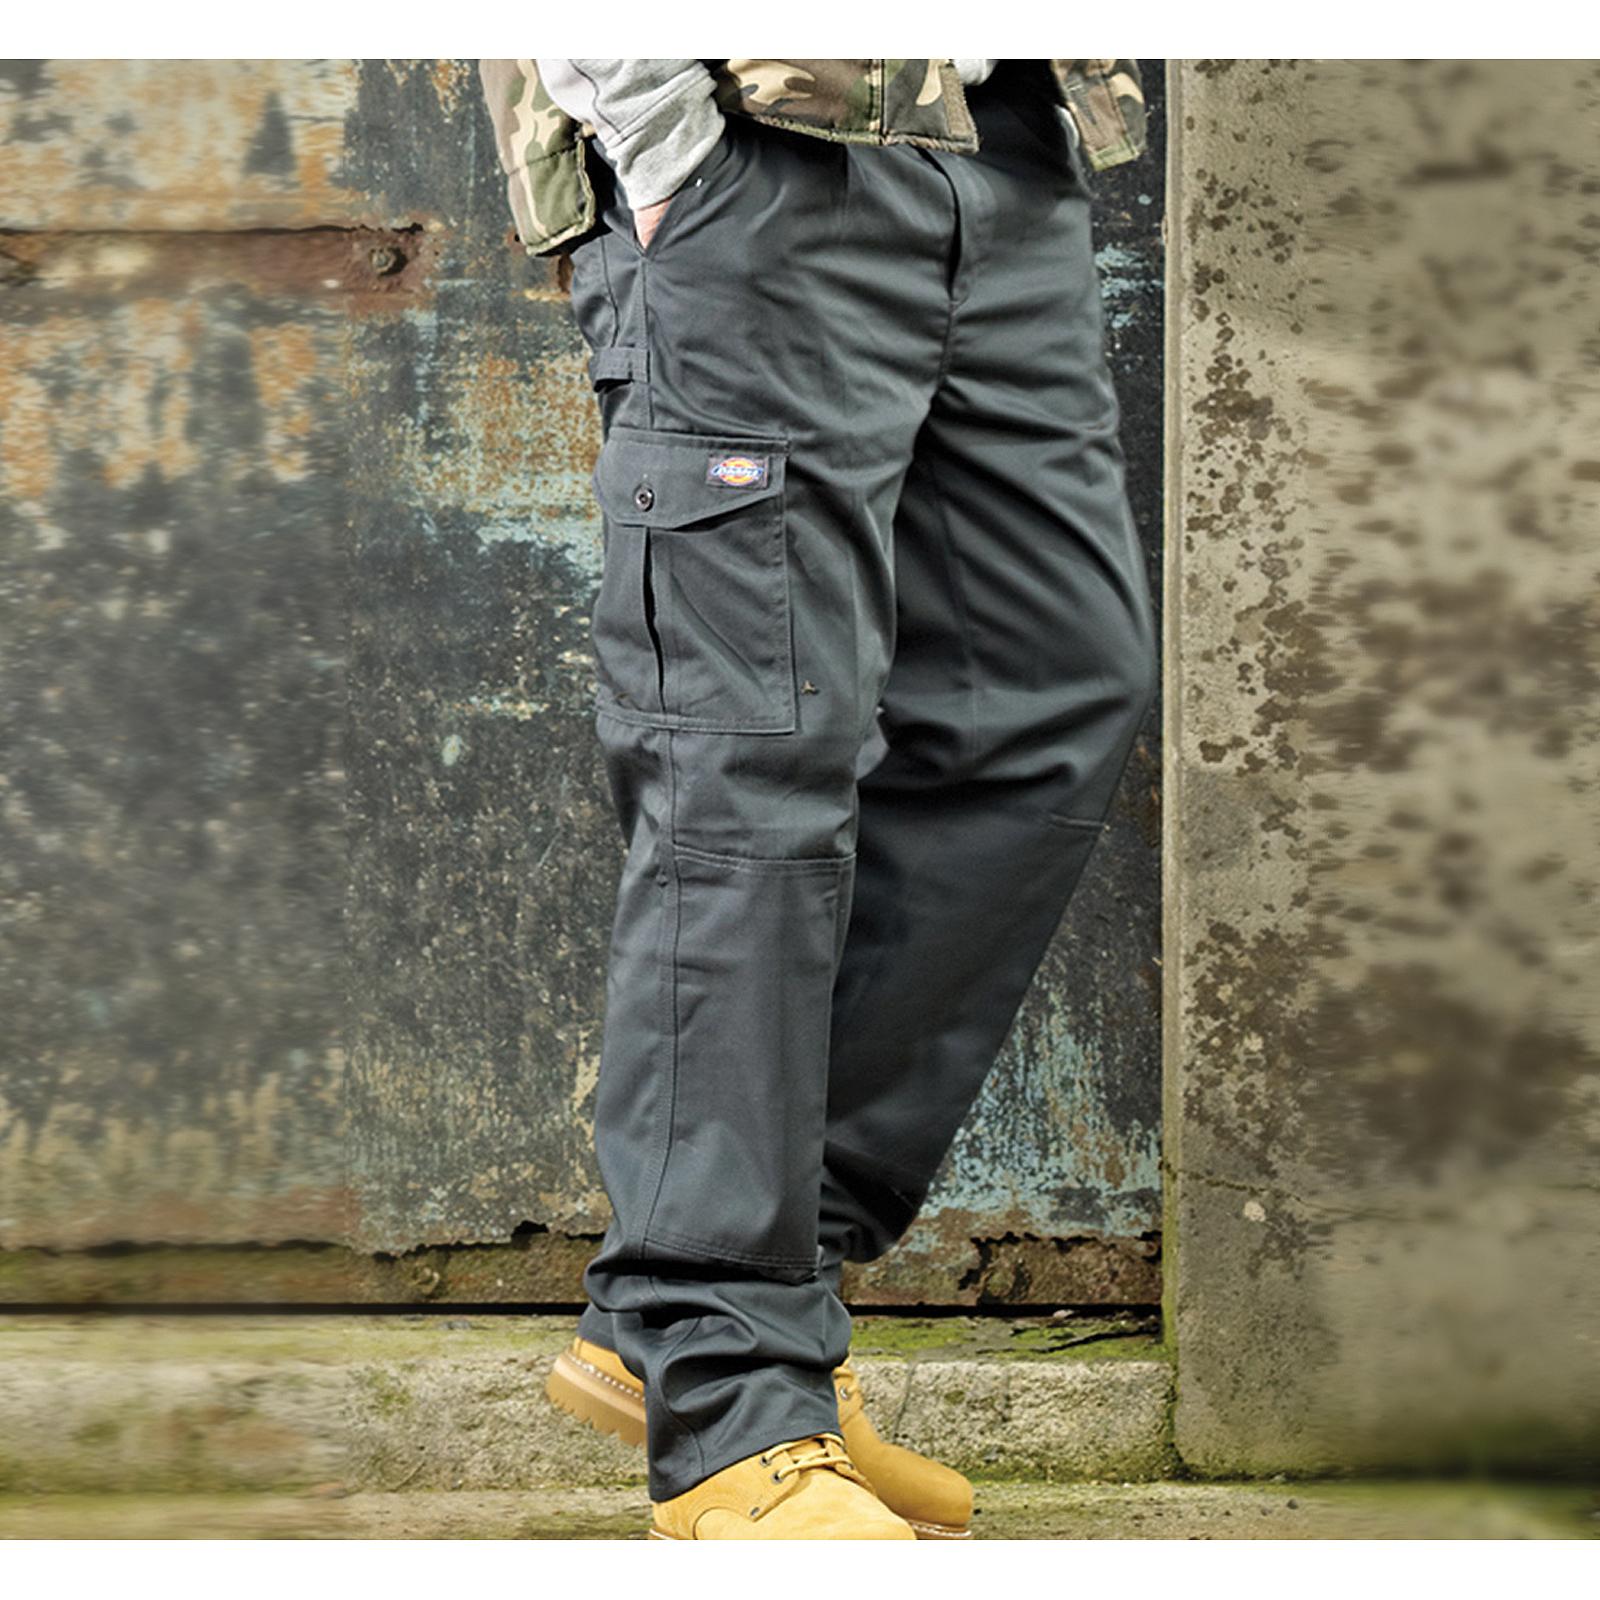 cca7bcdde7 Details about Dickies Redhawk Super Uniform Cargo Combat Work Trousers  Men's Durable Workwear